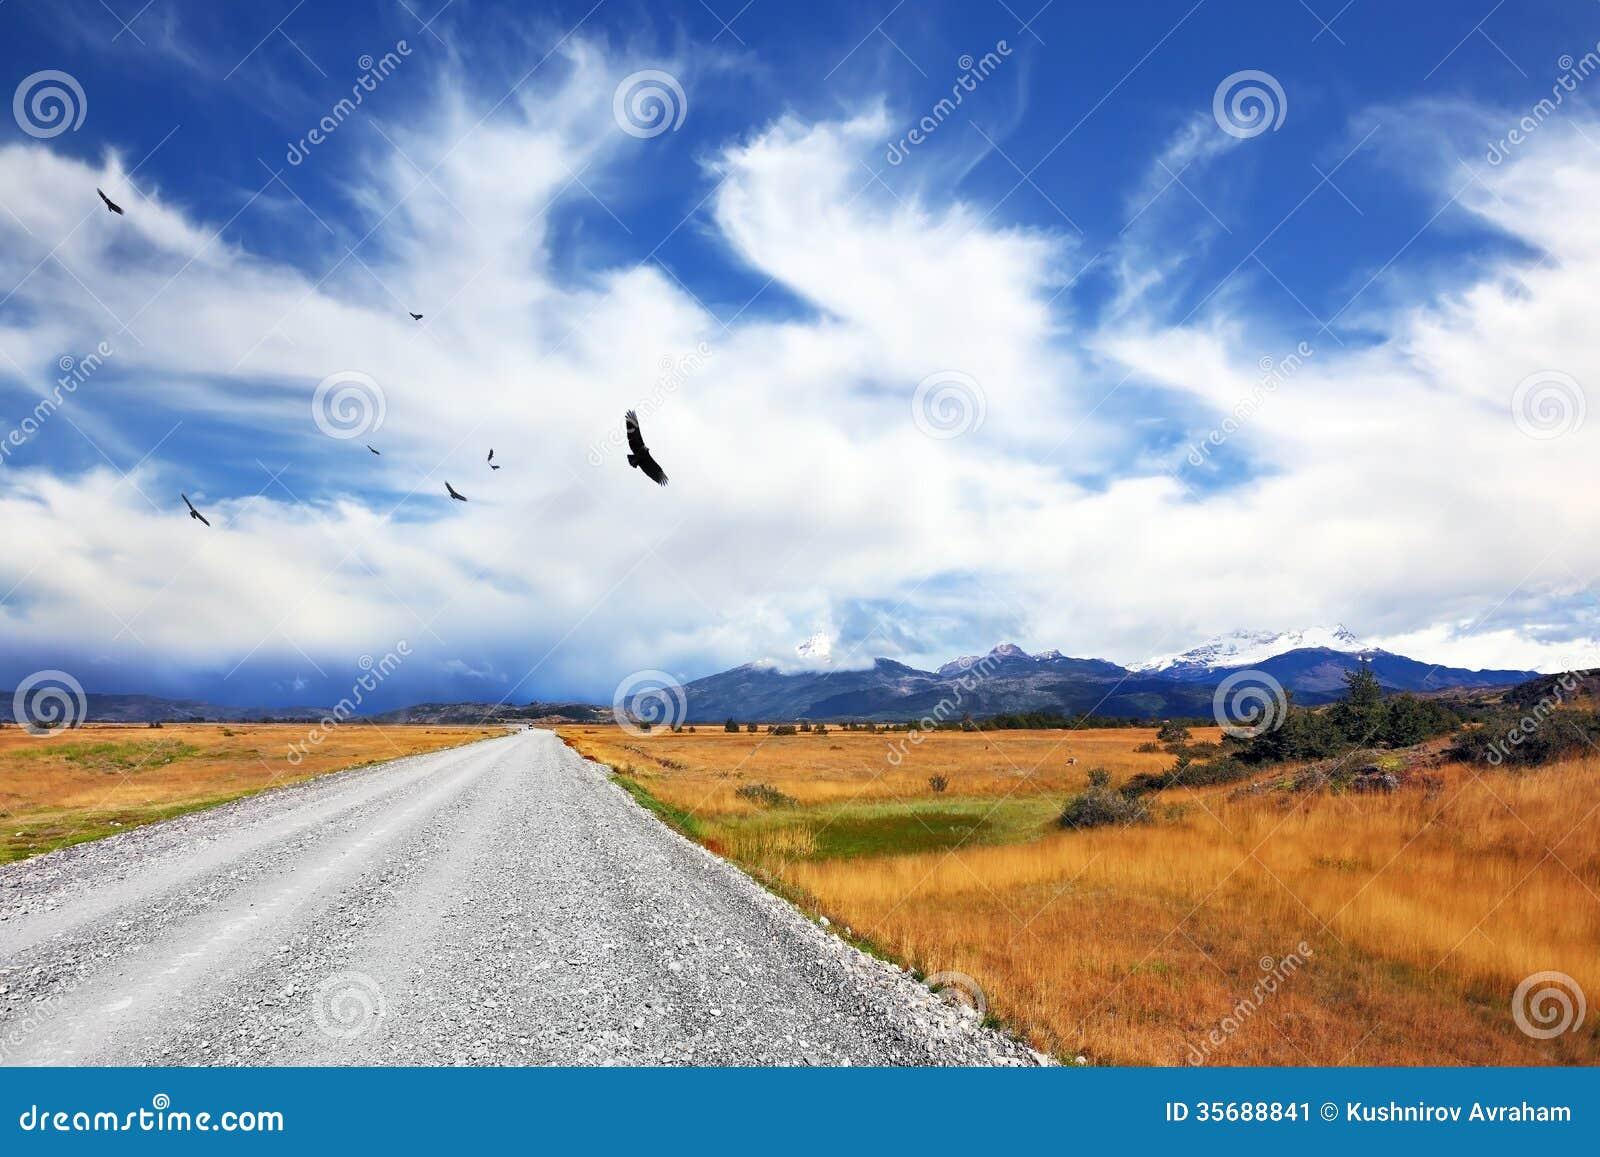 Boven de landweg stijgt de Andescondor